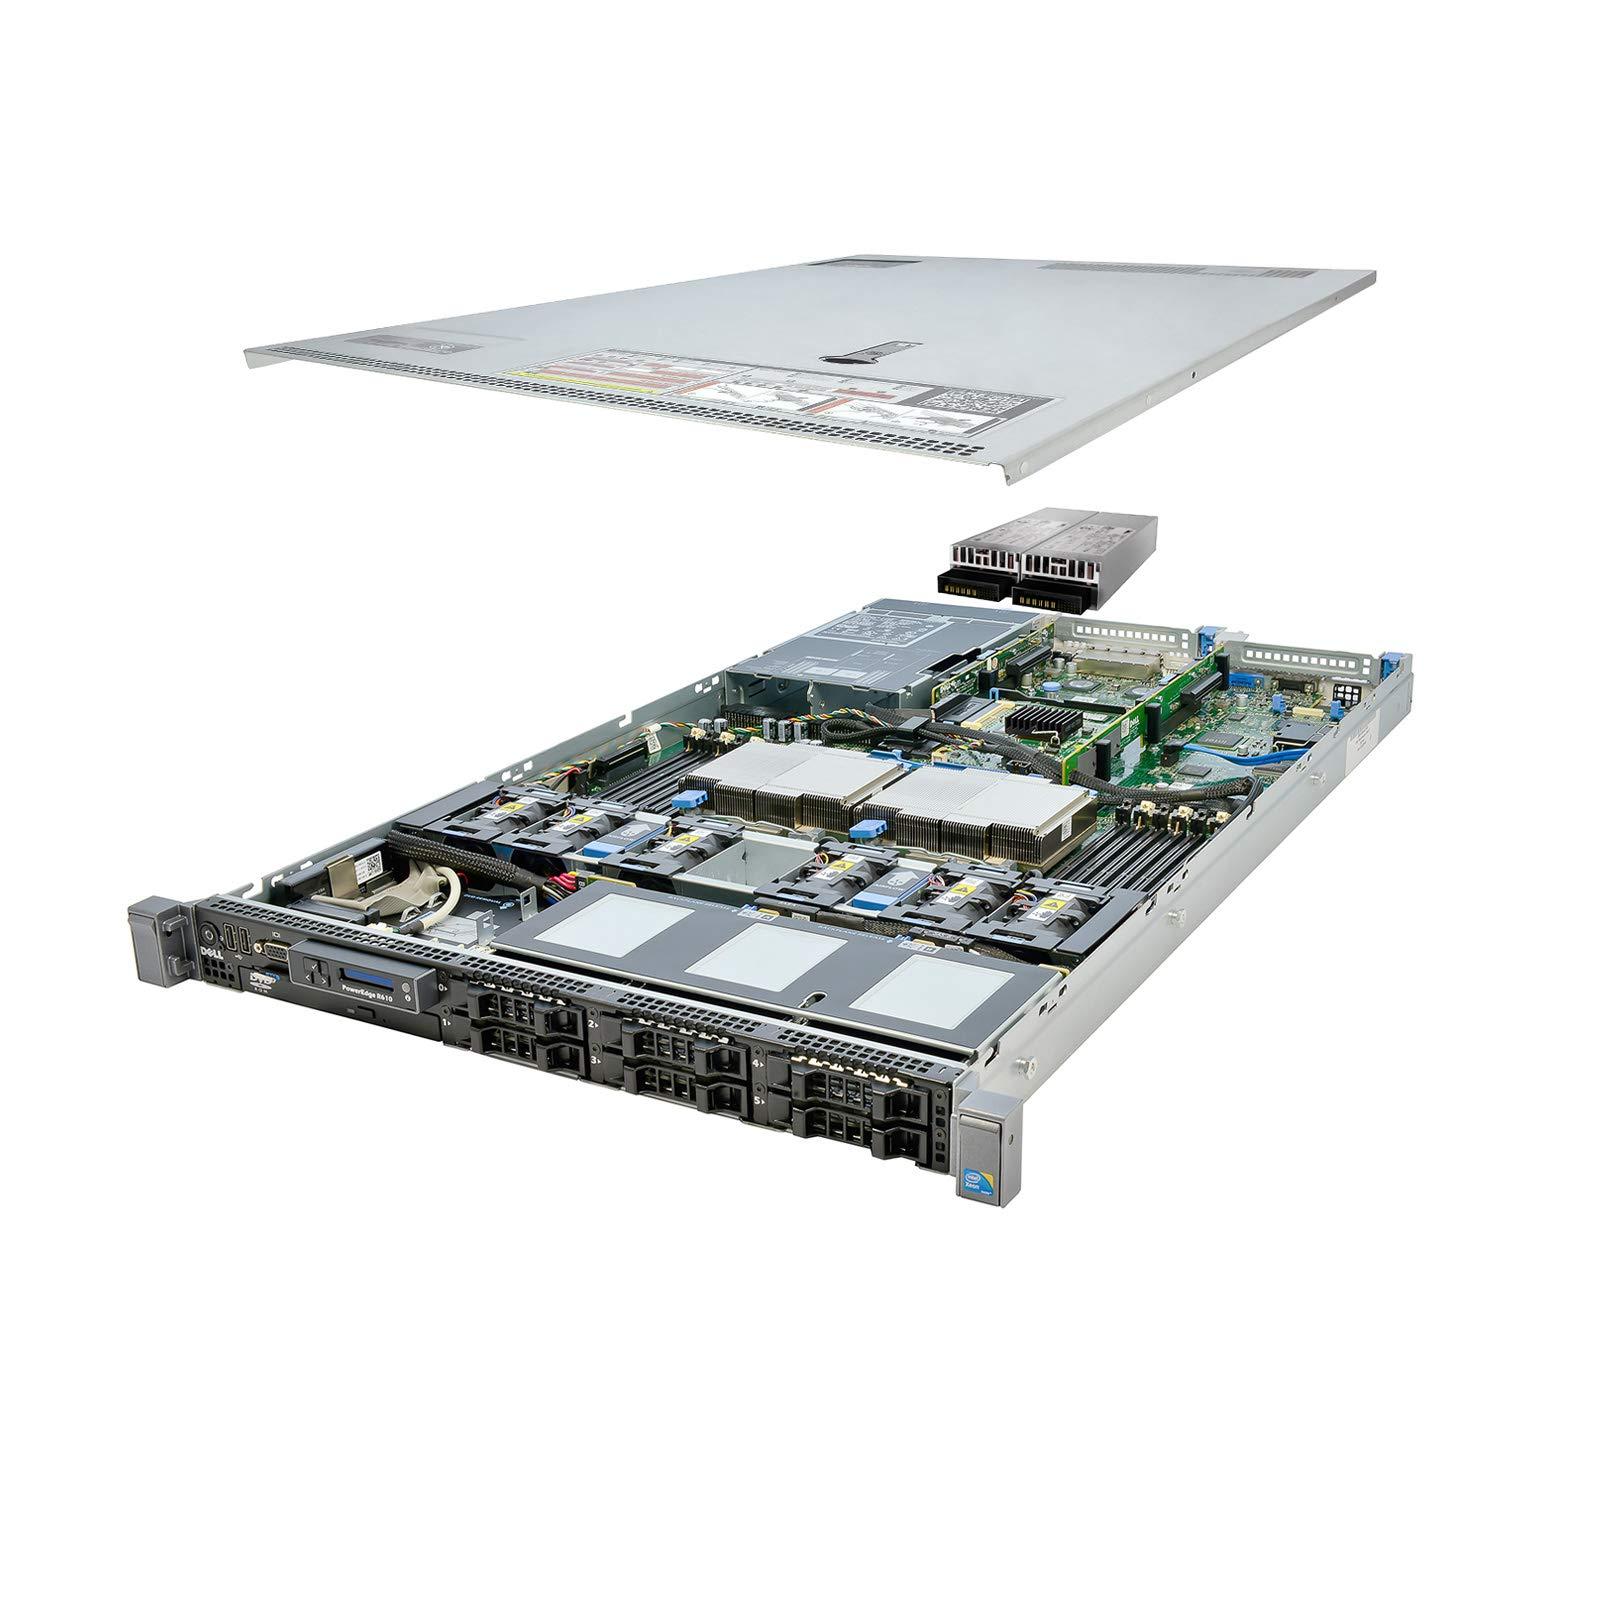 DELL PowerEdge R610 Server 2X 3.33Ghz X5680 6C 128GB 6X Caddies Premium (Renewed)